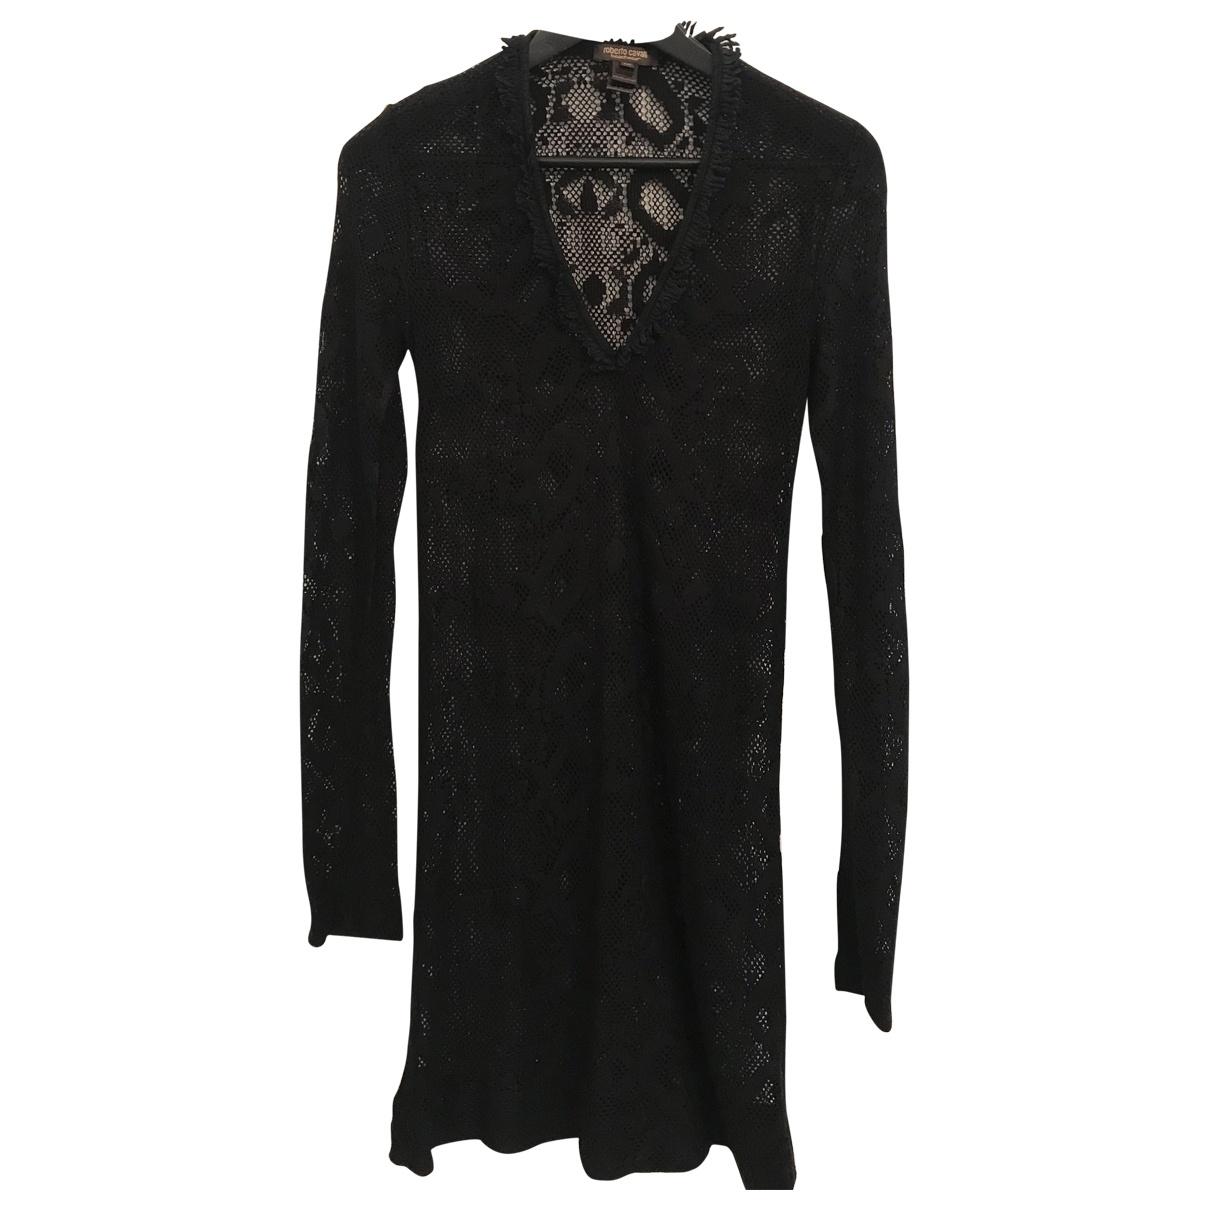 Roberto Cavalli N Black dress for Women M International